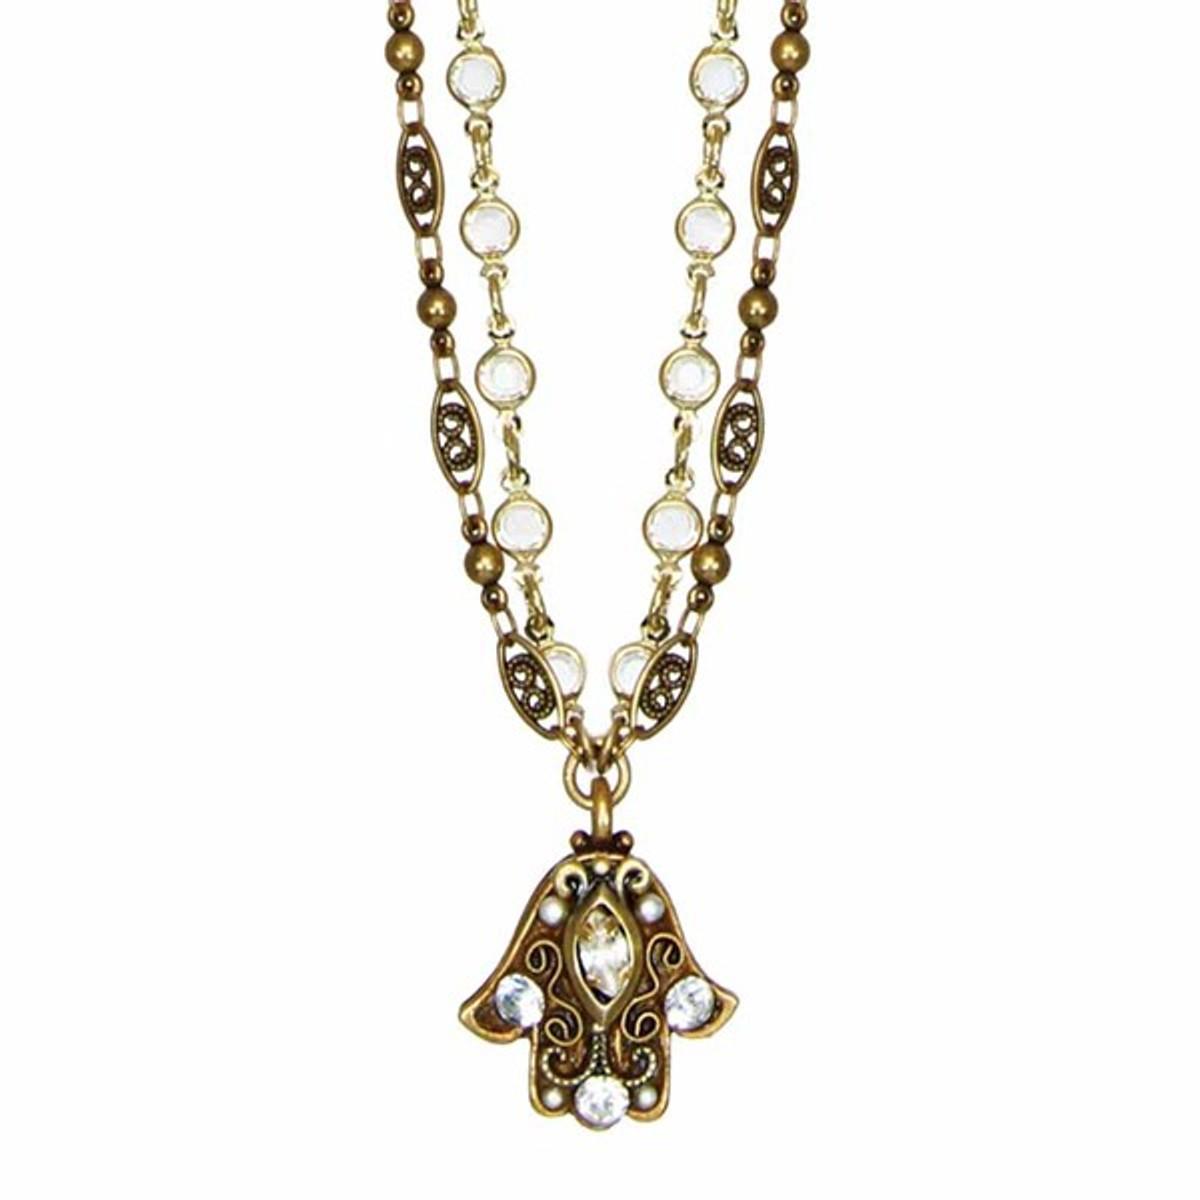 Hamsa Necklace w/ Small Crystal